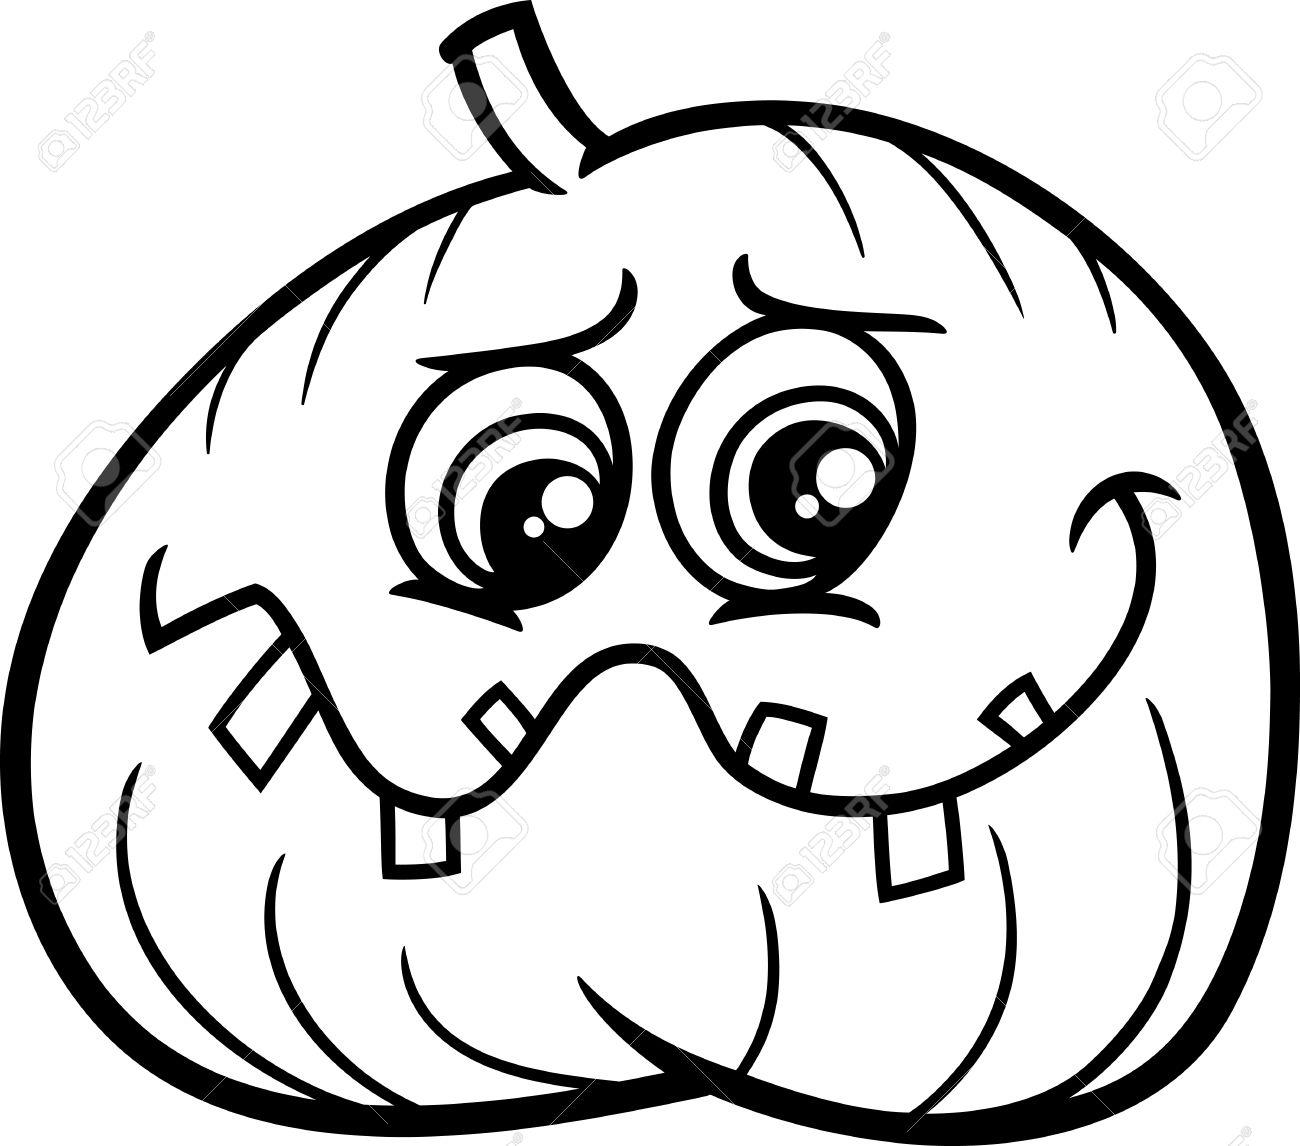 Black And White Cartoon Illustration Of Halloween Jack Lantern ...